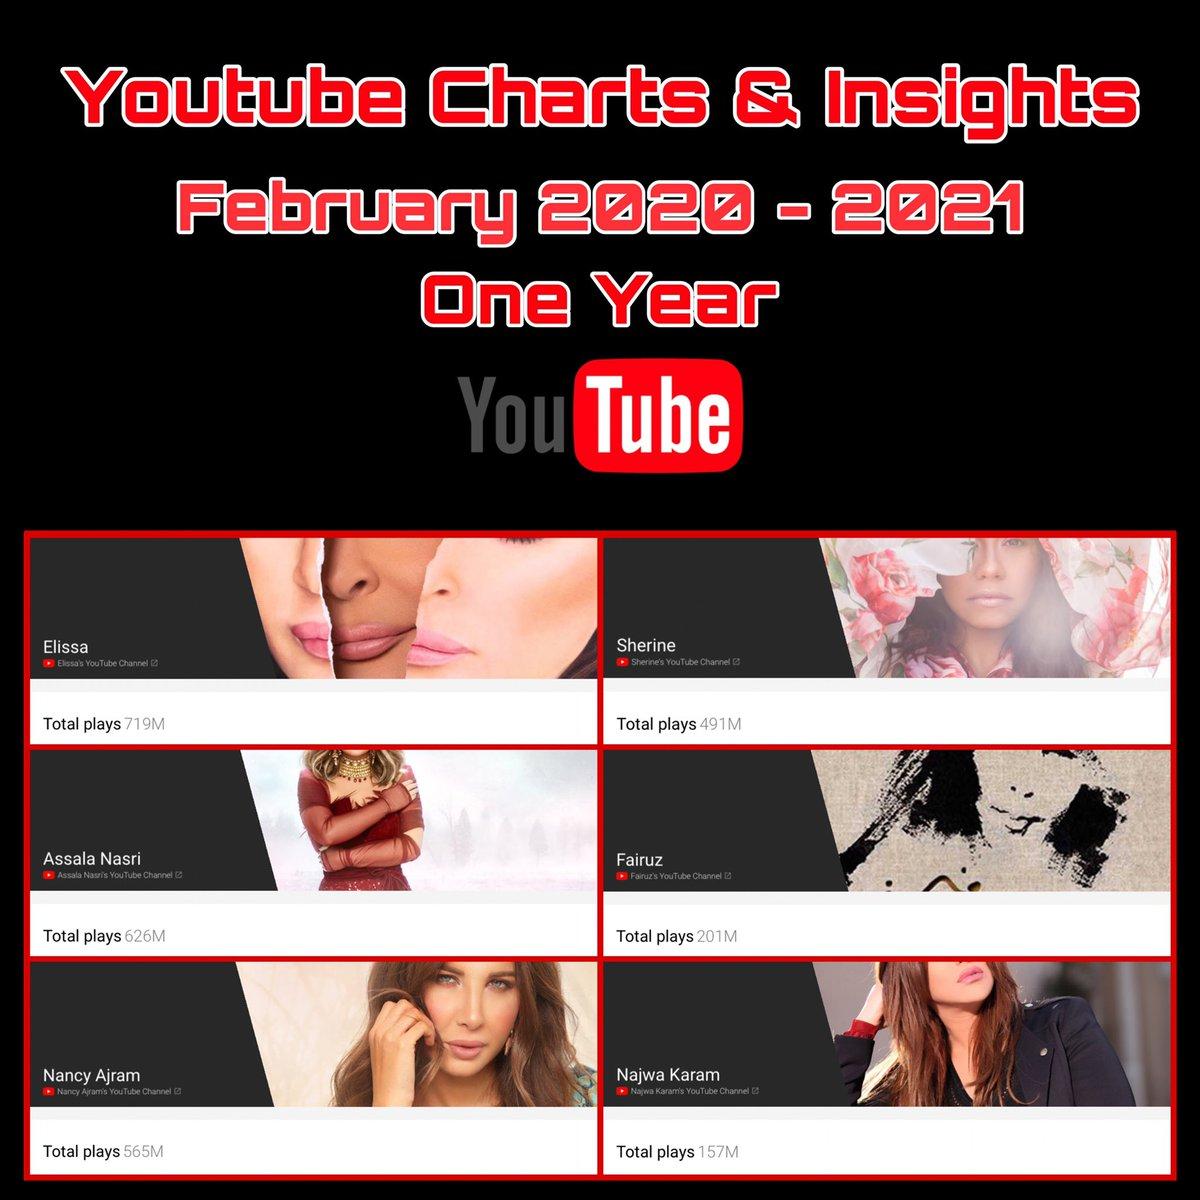 Youtube Views Charts & insights February 2020 - 2021 One year  @elissakh 719M #اليسا  @AssalaOfficial 626M #اصالة  @NancyAjram 565M #نانسي_عجرم  @sherine 491M #شيرين  @FayrouzOfficial 201M #فيروز  @najwakaram 157M #نجوى_كرم